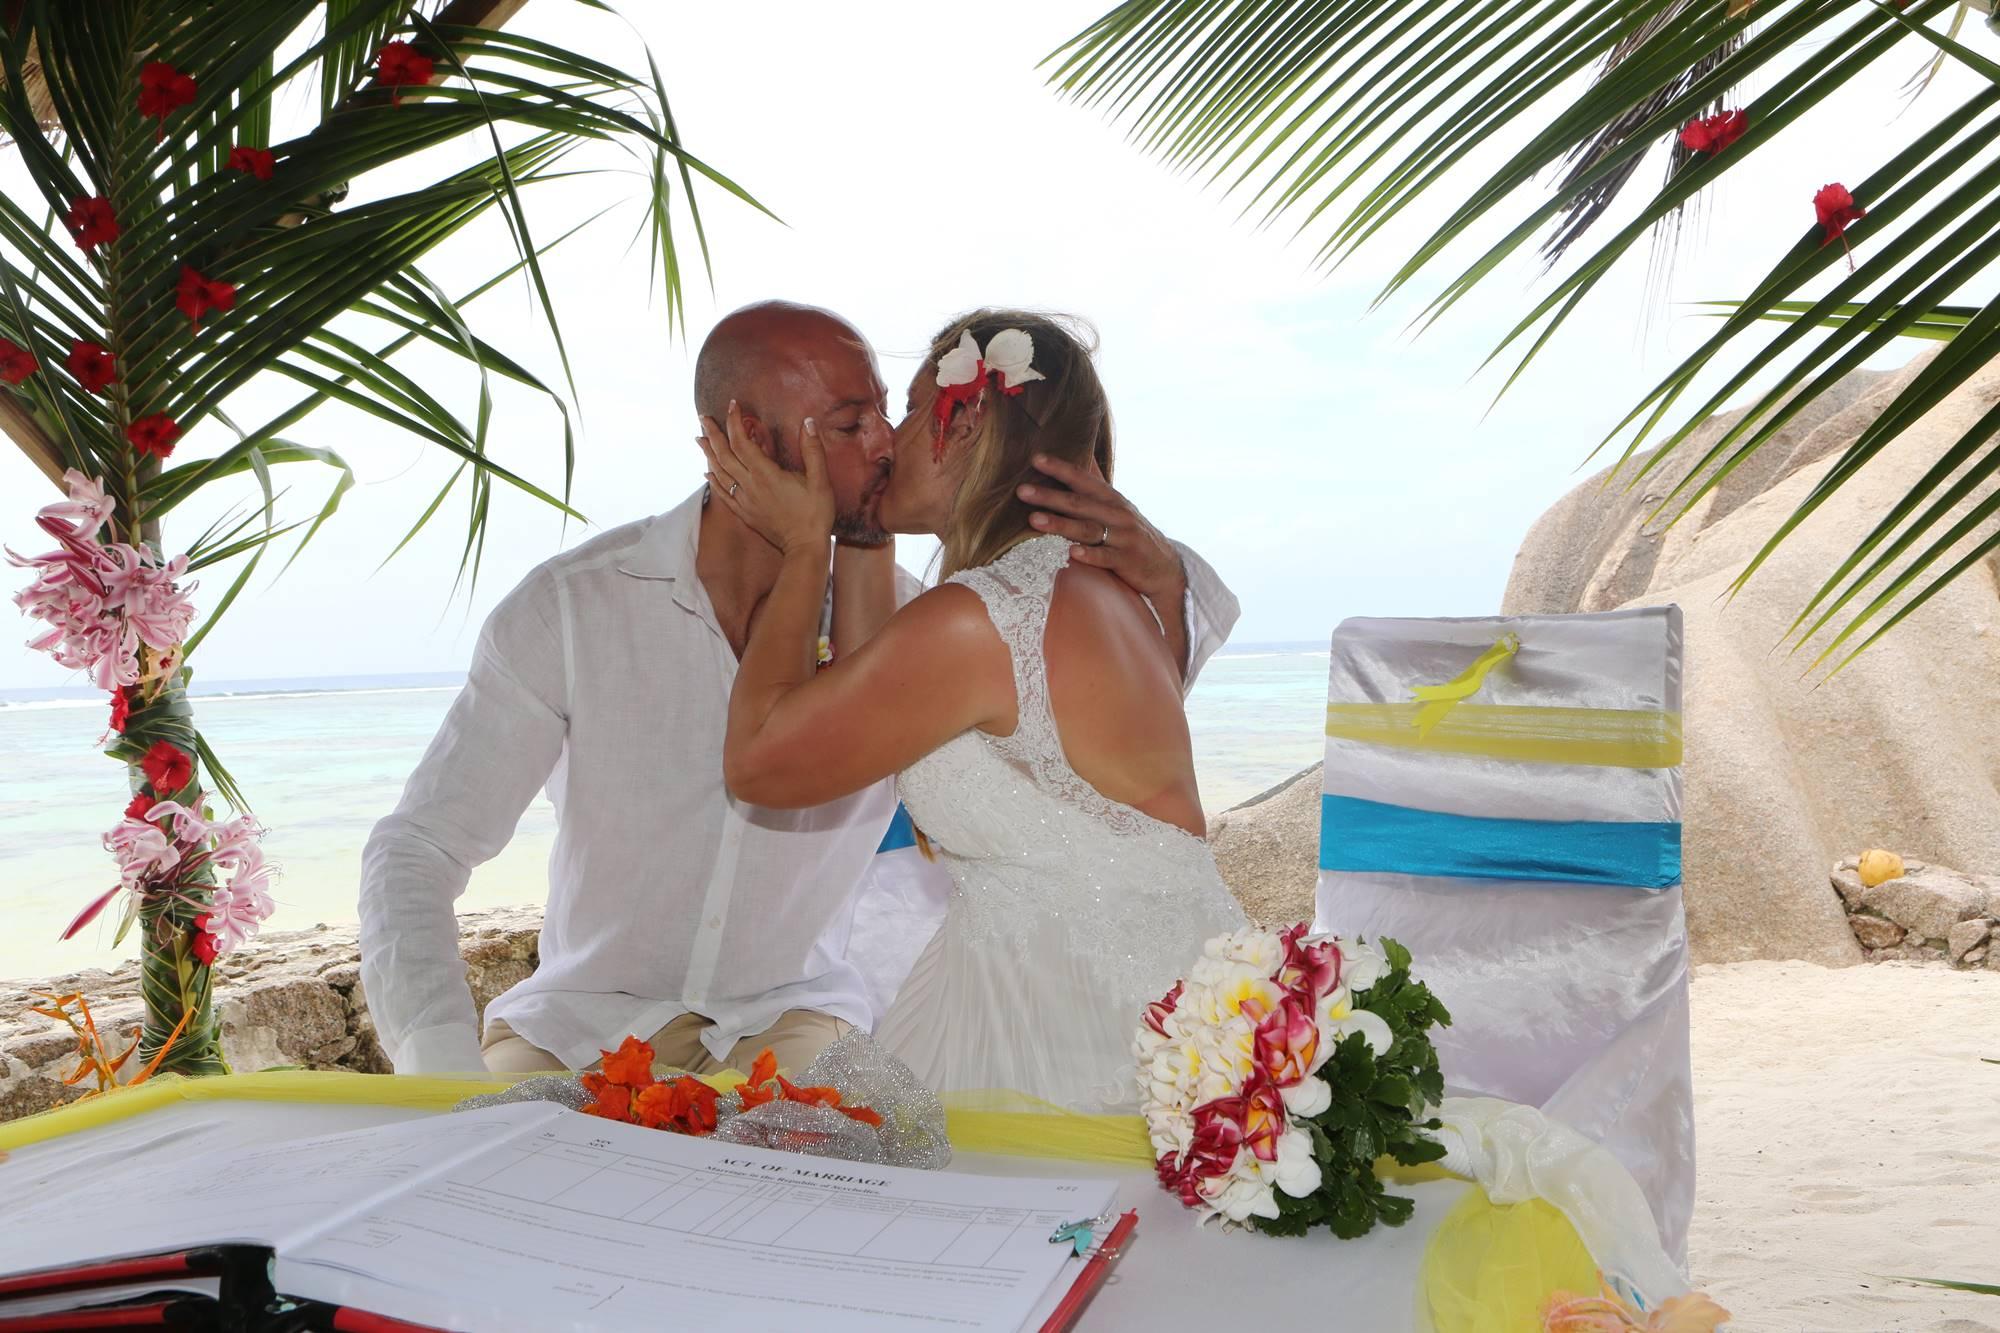 Matrimonio Simbolico Alle Seychelles : Foto matrimonio alle seychelles di gabriella e stefano